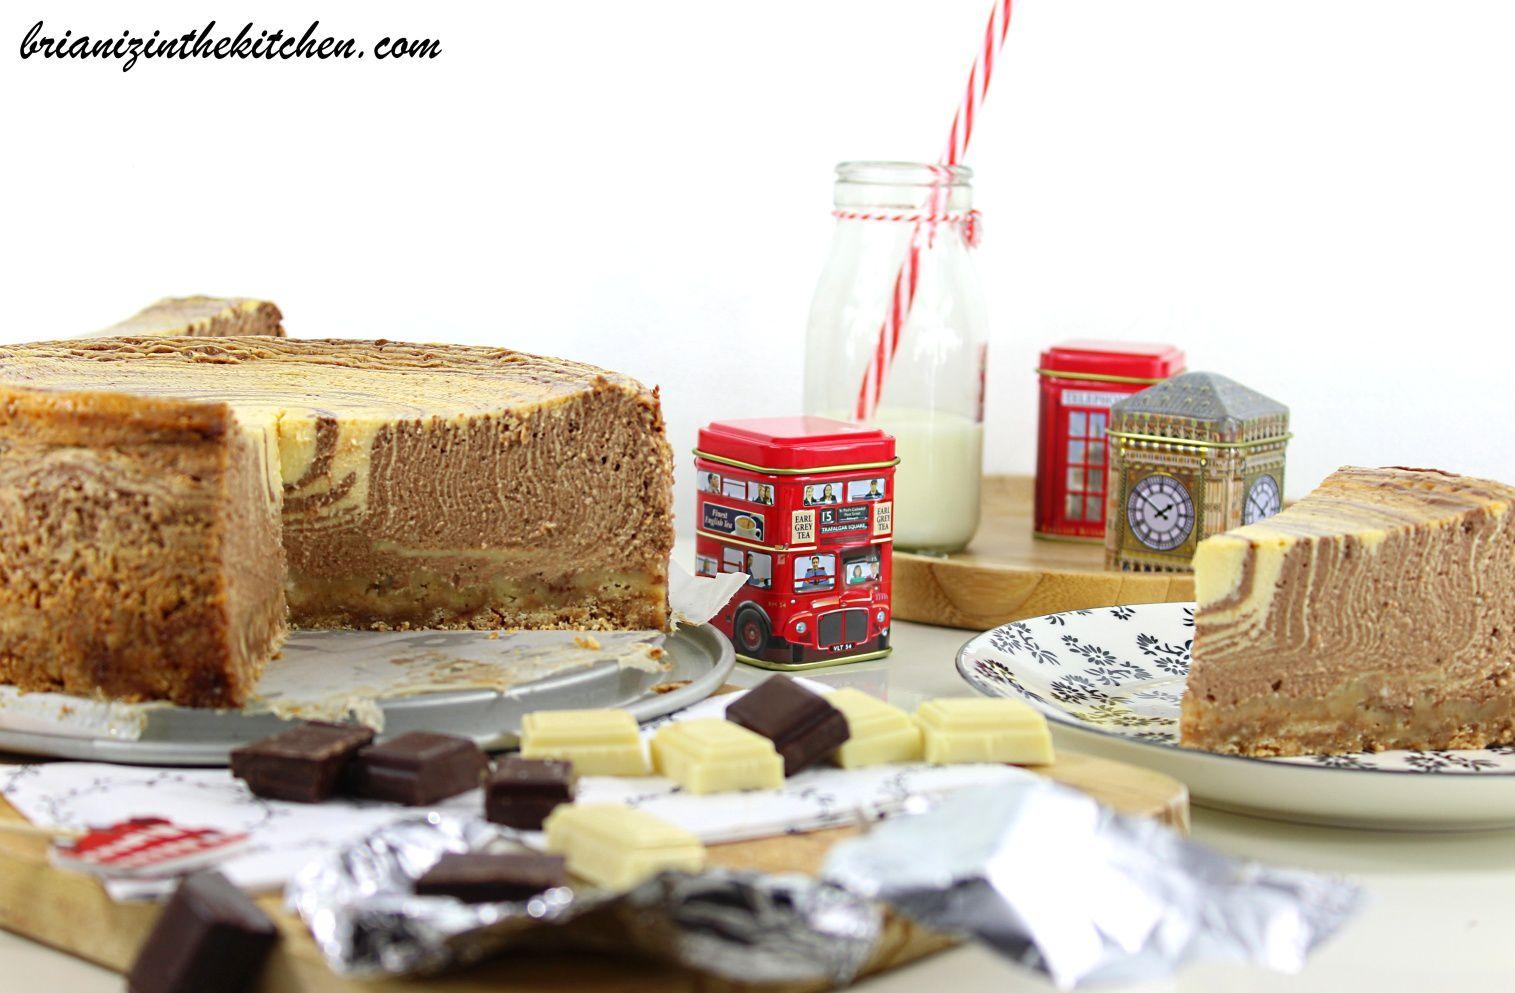 Zebra cheesecake aux deux chocolats brian iz in the kitchen - Cheesecake philadelphia fromage blanc ...